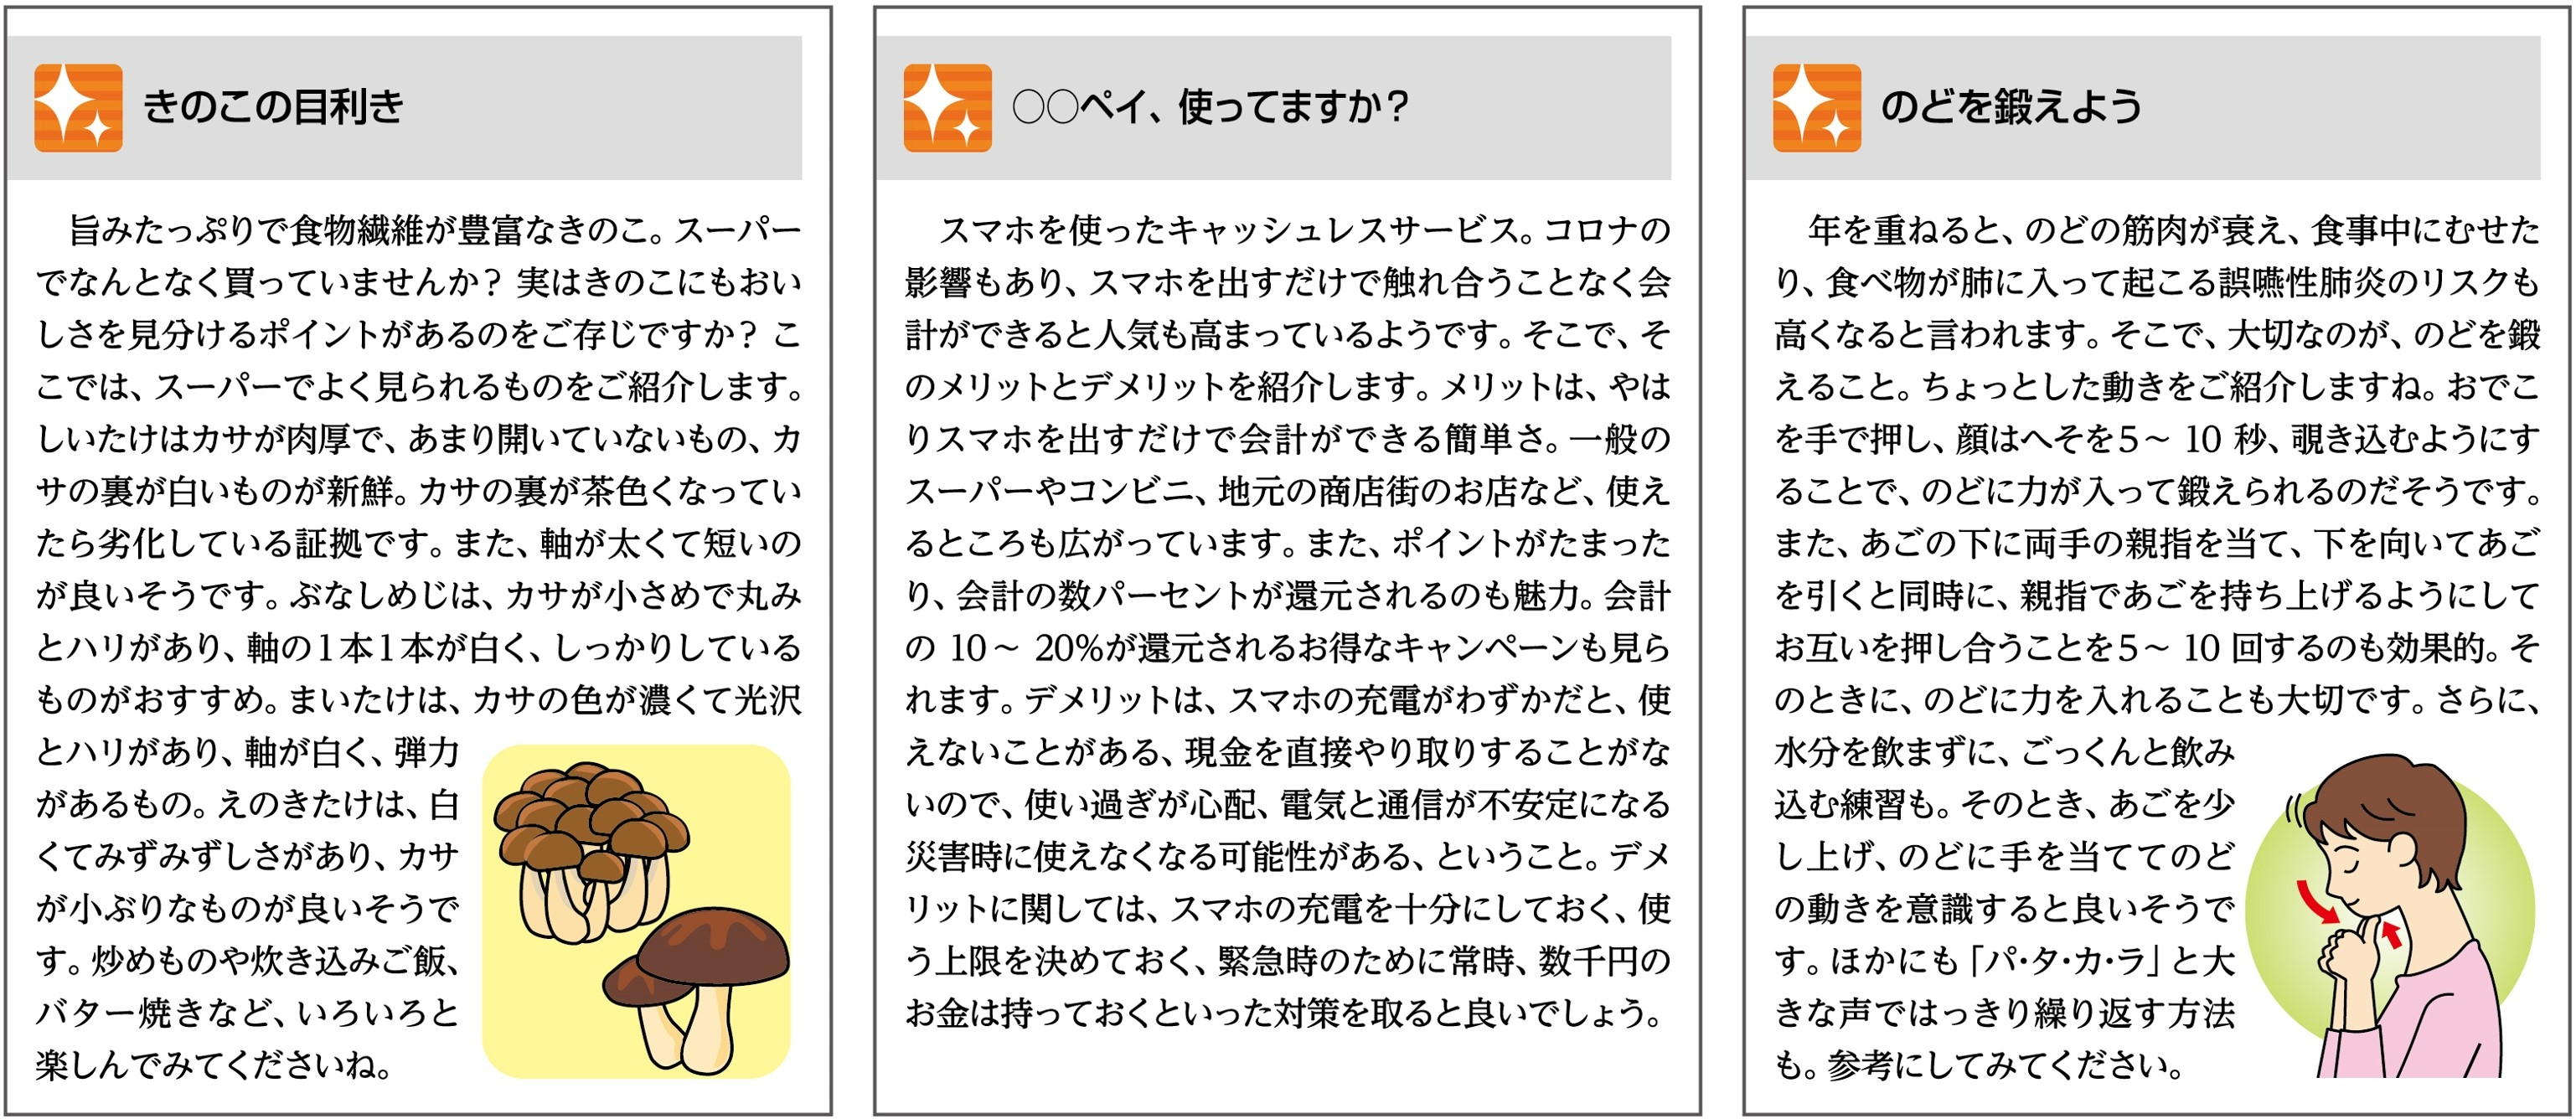 https://www.matsuzaki-k.jp/diaryblog/84abdd6eca1000e537c02a2710ded94528866150.jpg